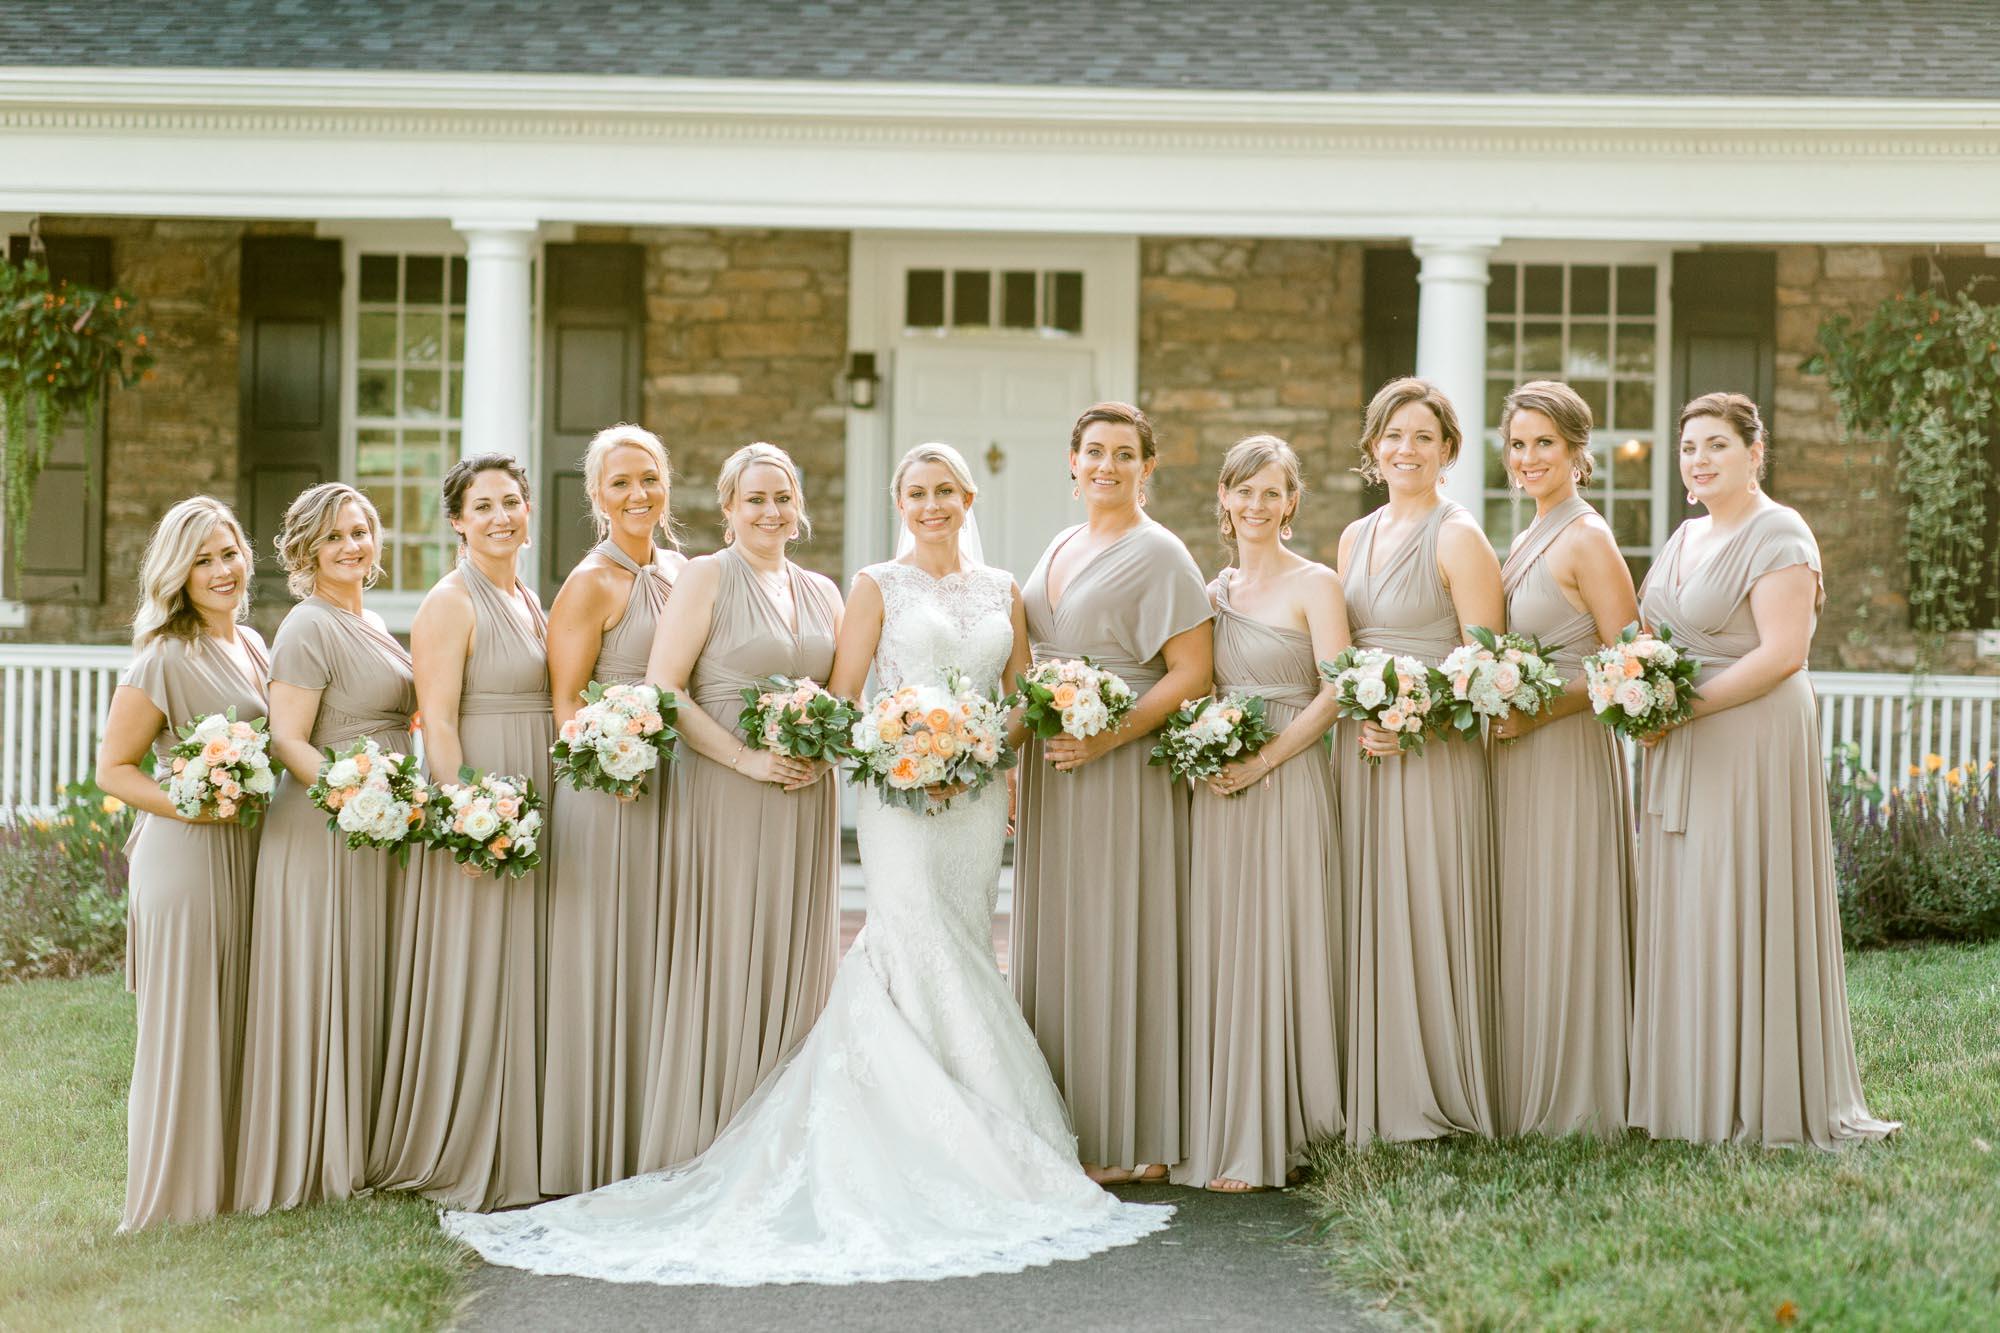 Allenberry-resort-historic-pennsylvania-wedding-22224.jpg